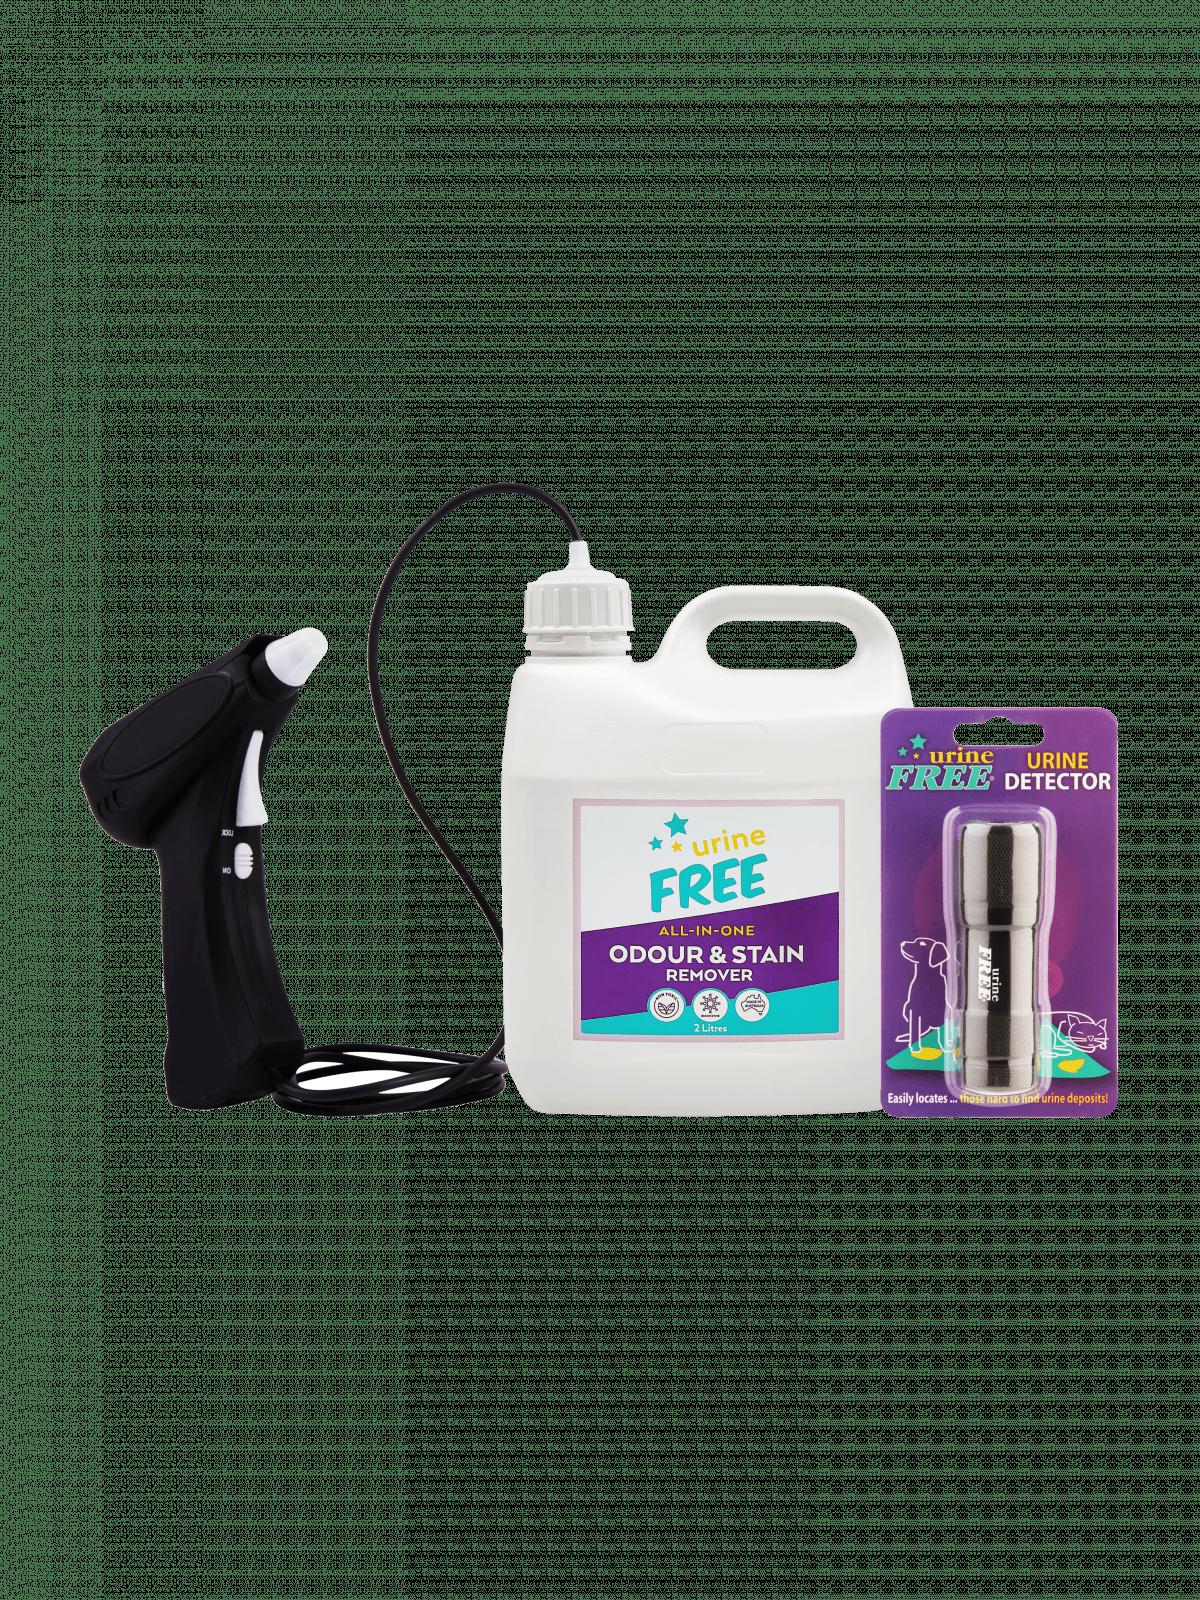 UrineFREE 2 Litre With Urine Detector _ Battery Sprayer